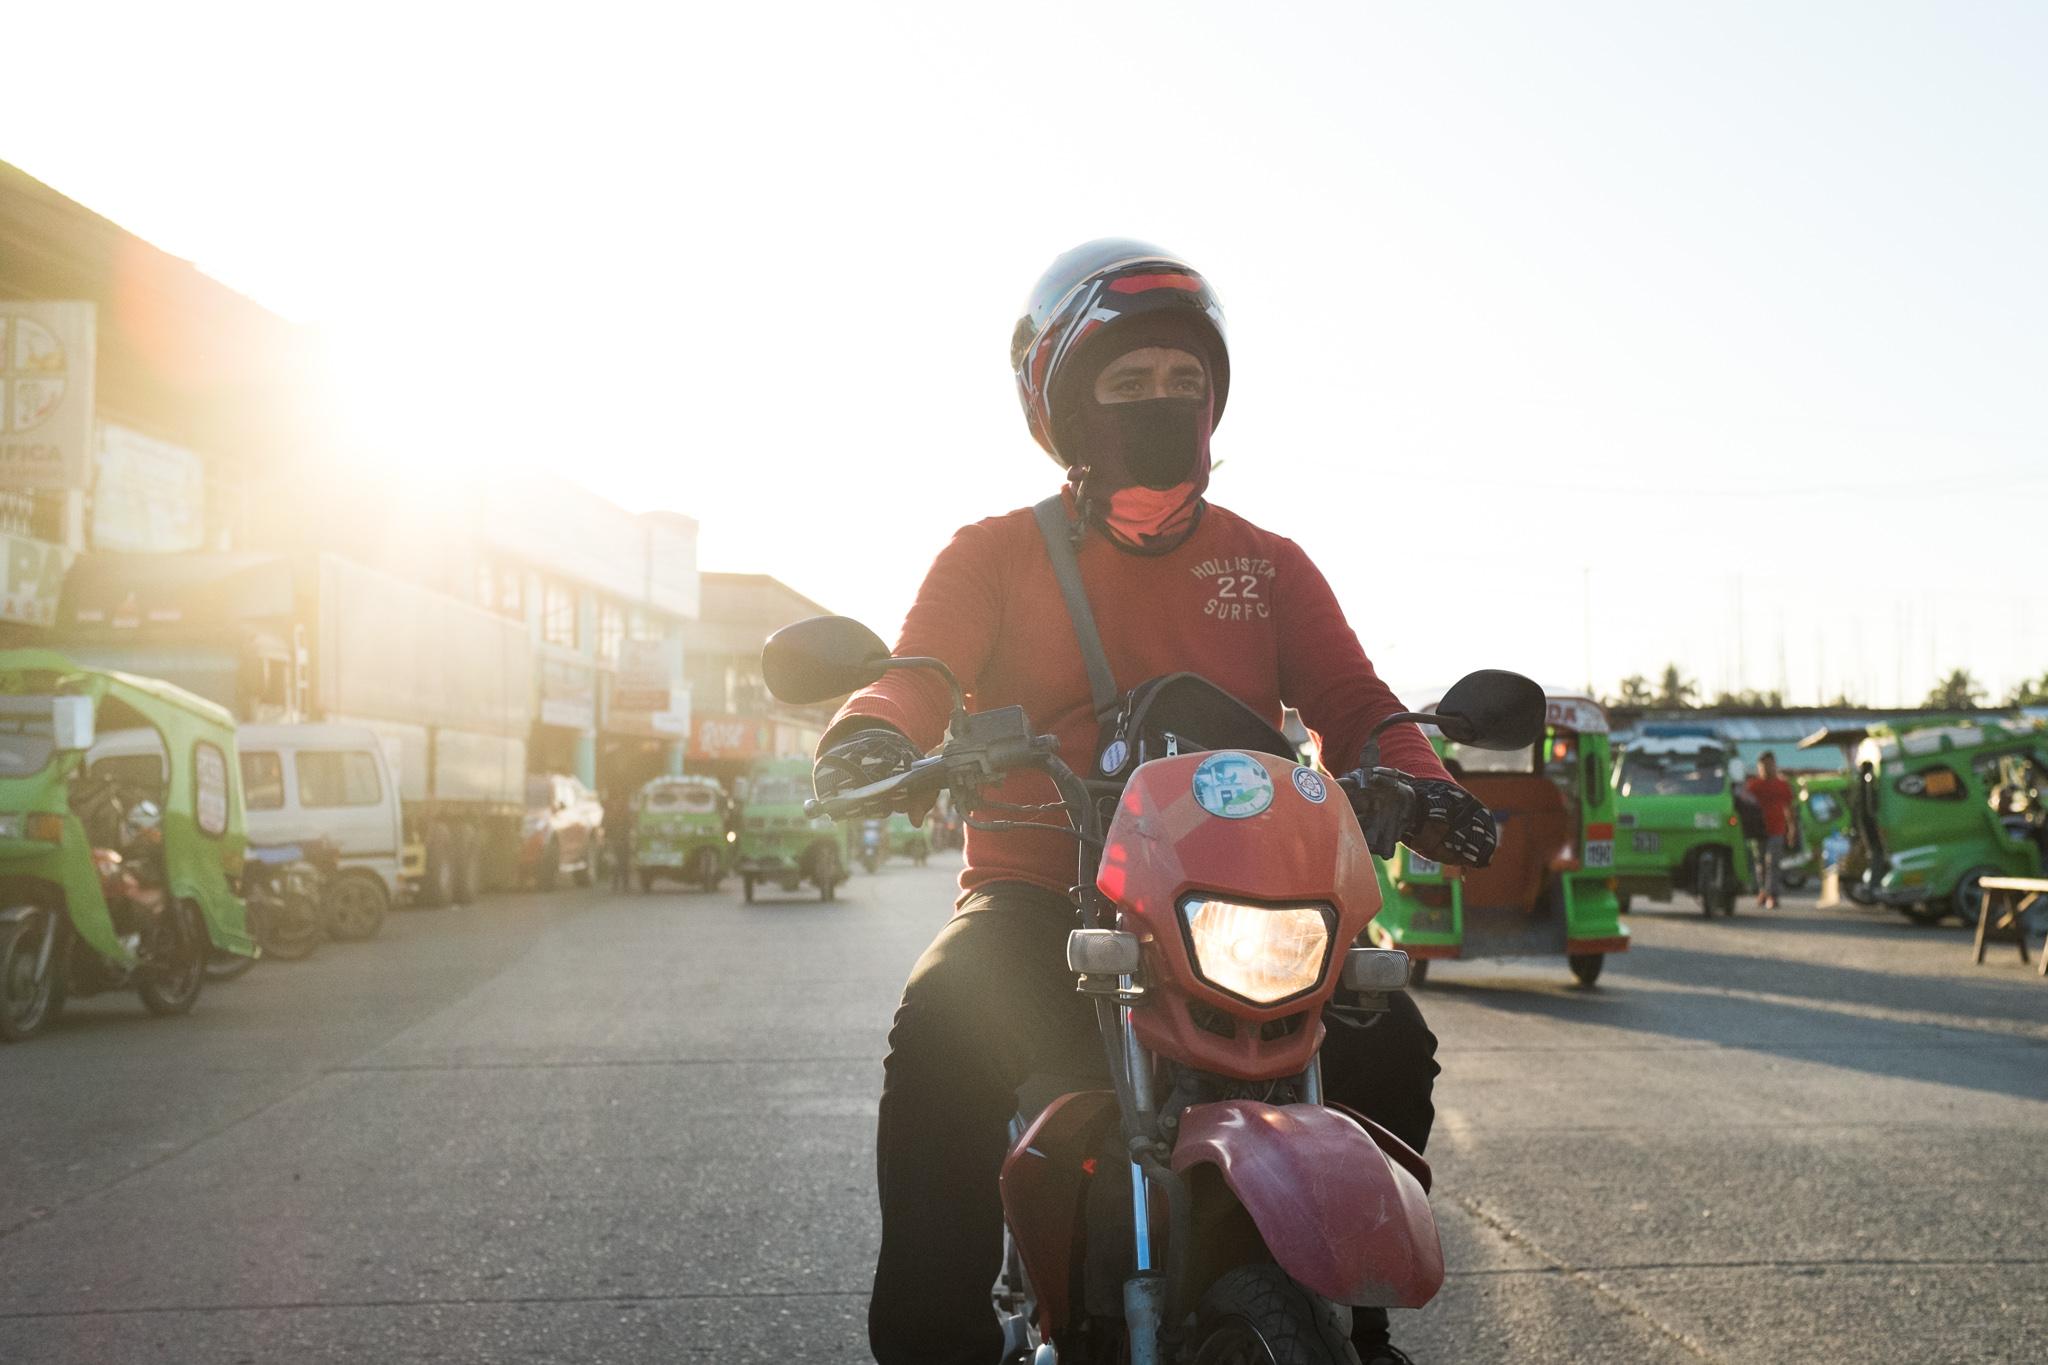 3157-philippines_scooter-biking.jpg